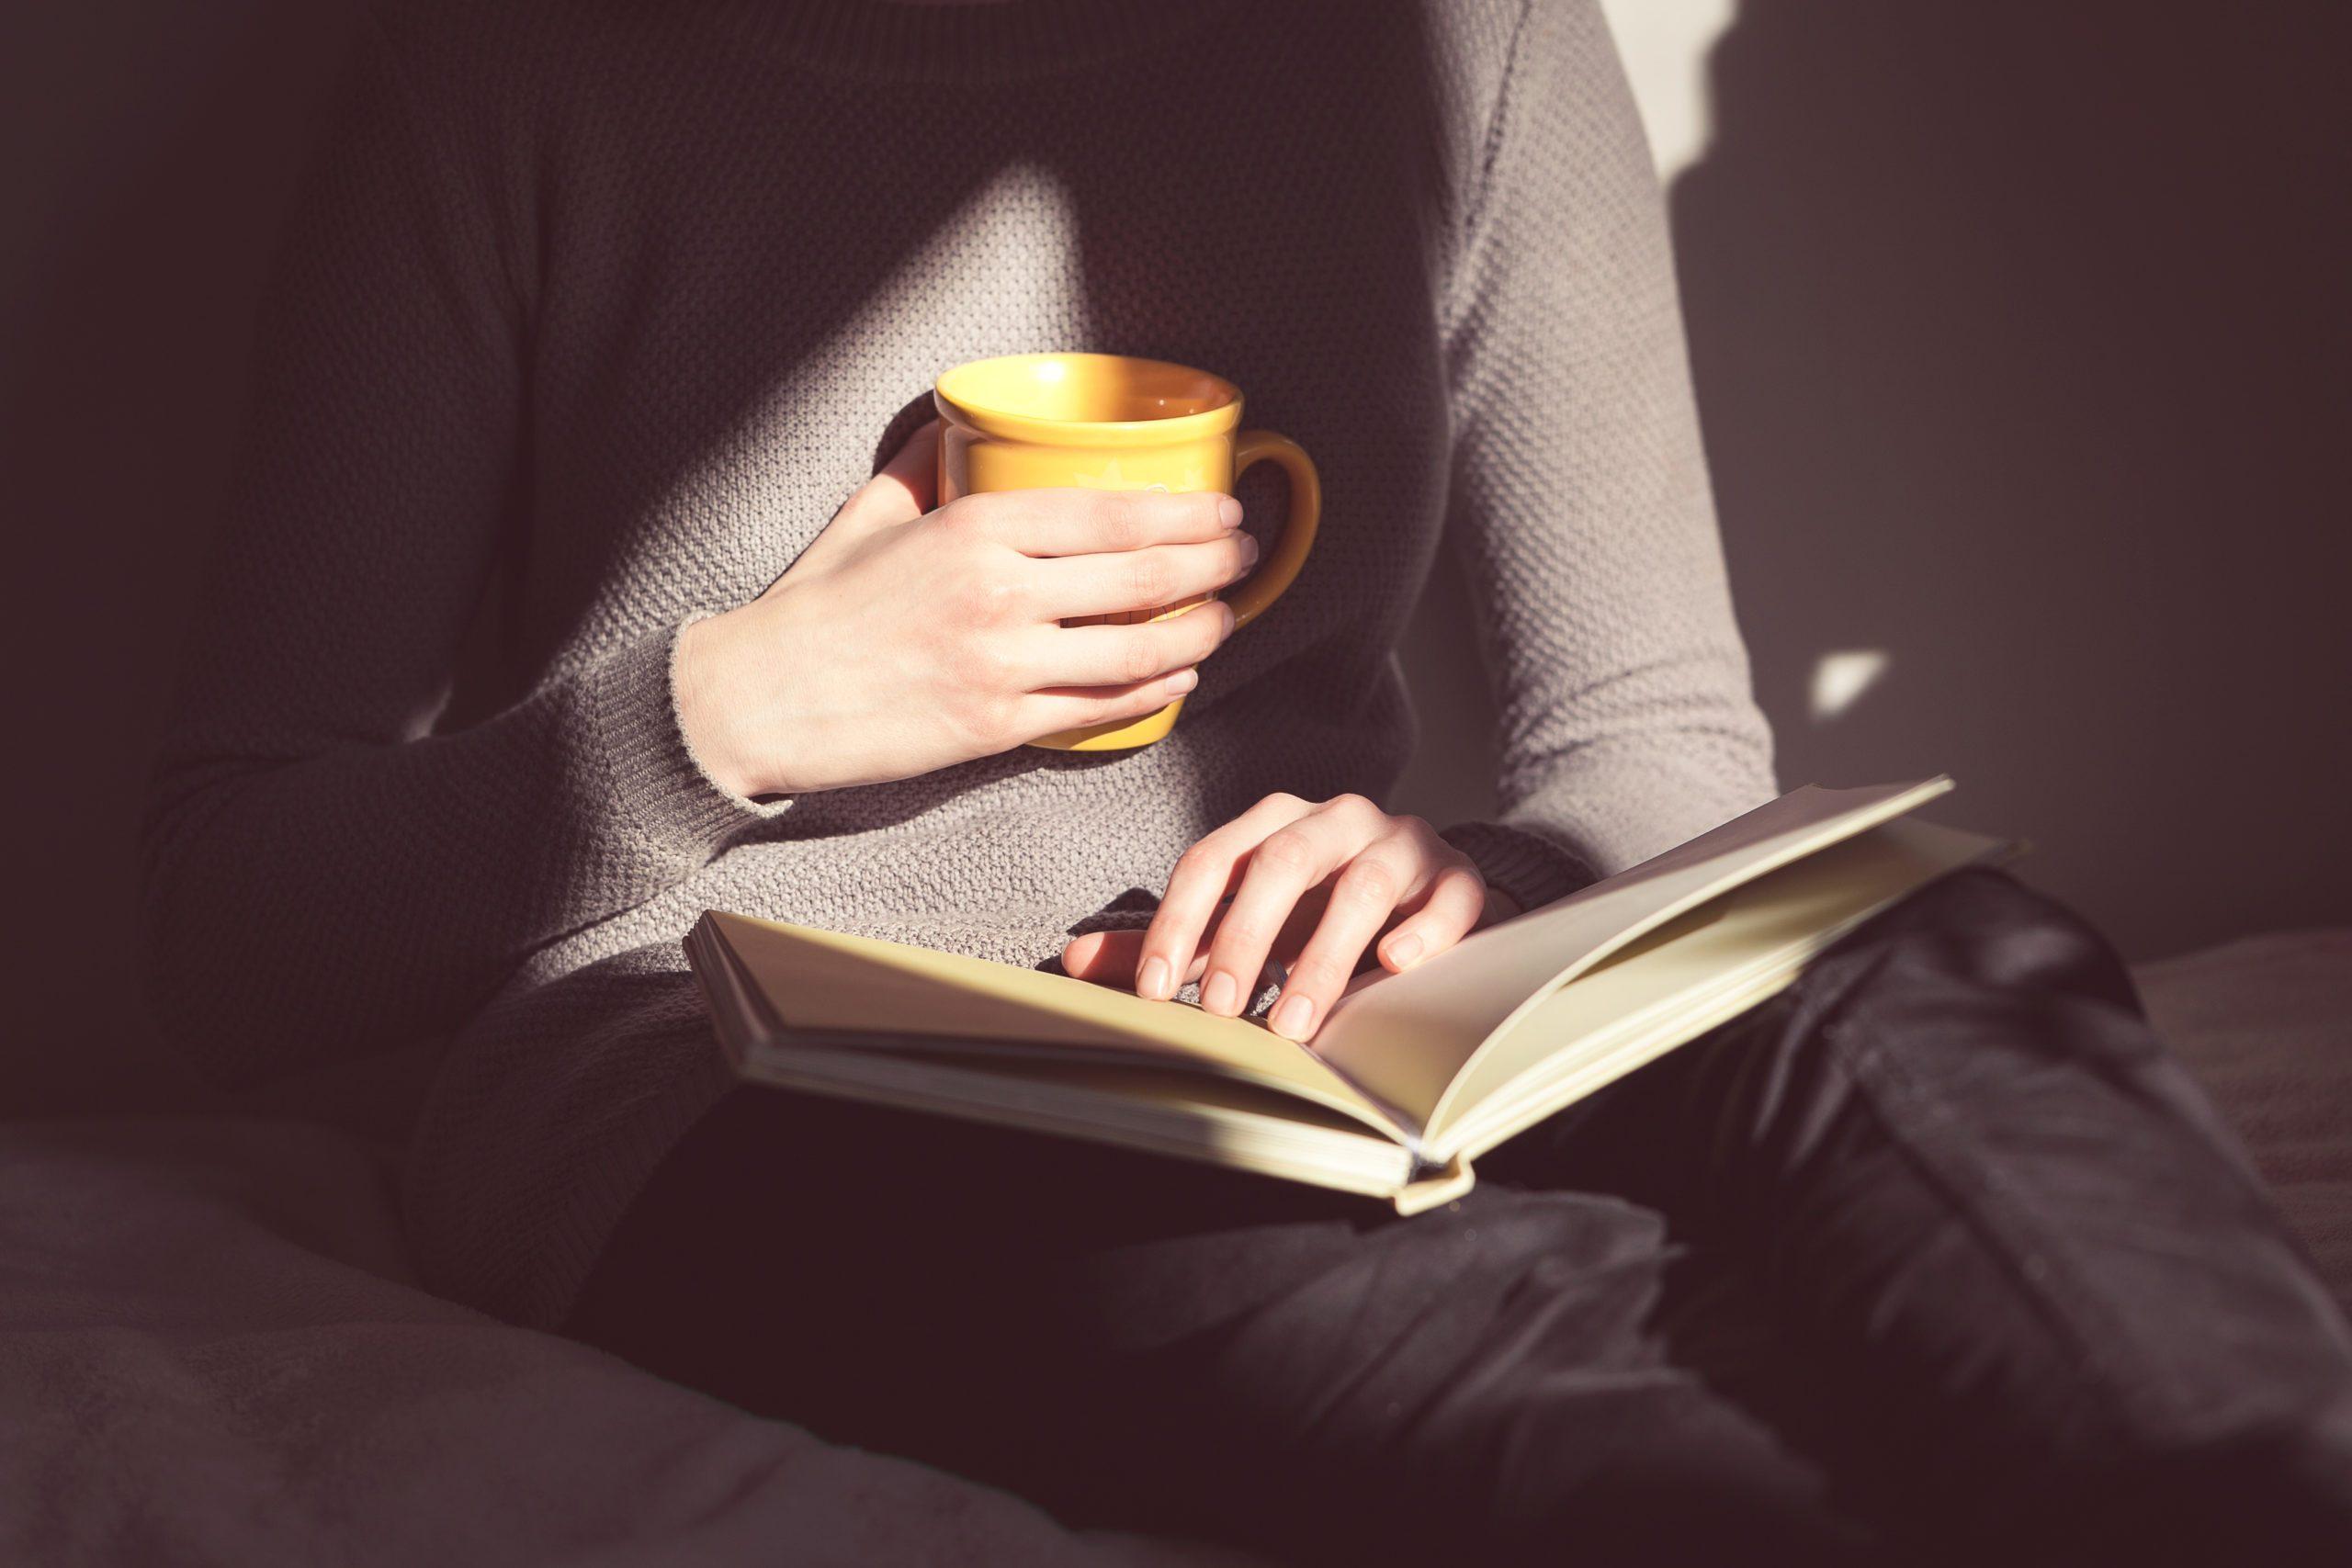 impact | woman holding mug and book | al etmanski